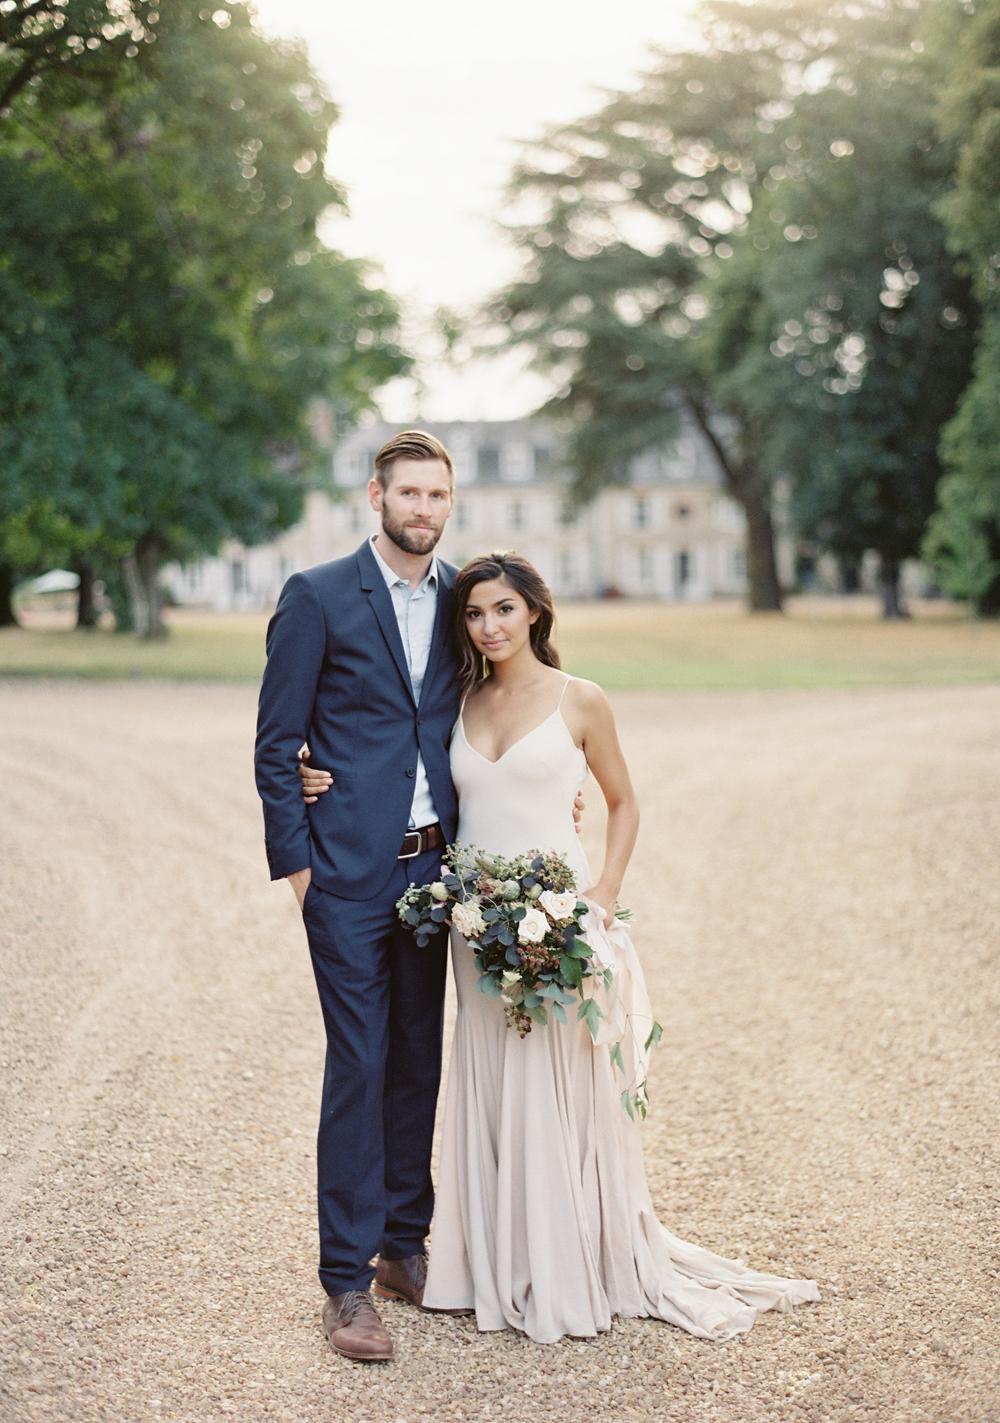 Vicki Grafton Photography Paris France Chateau wedding  Film Wedding photographer -9.jpg